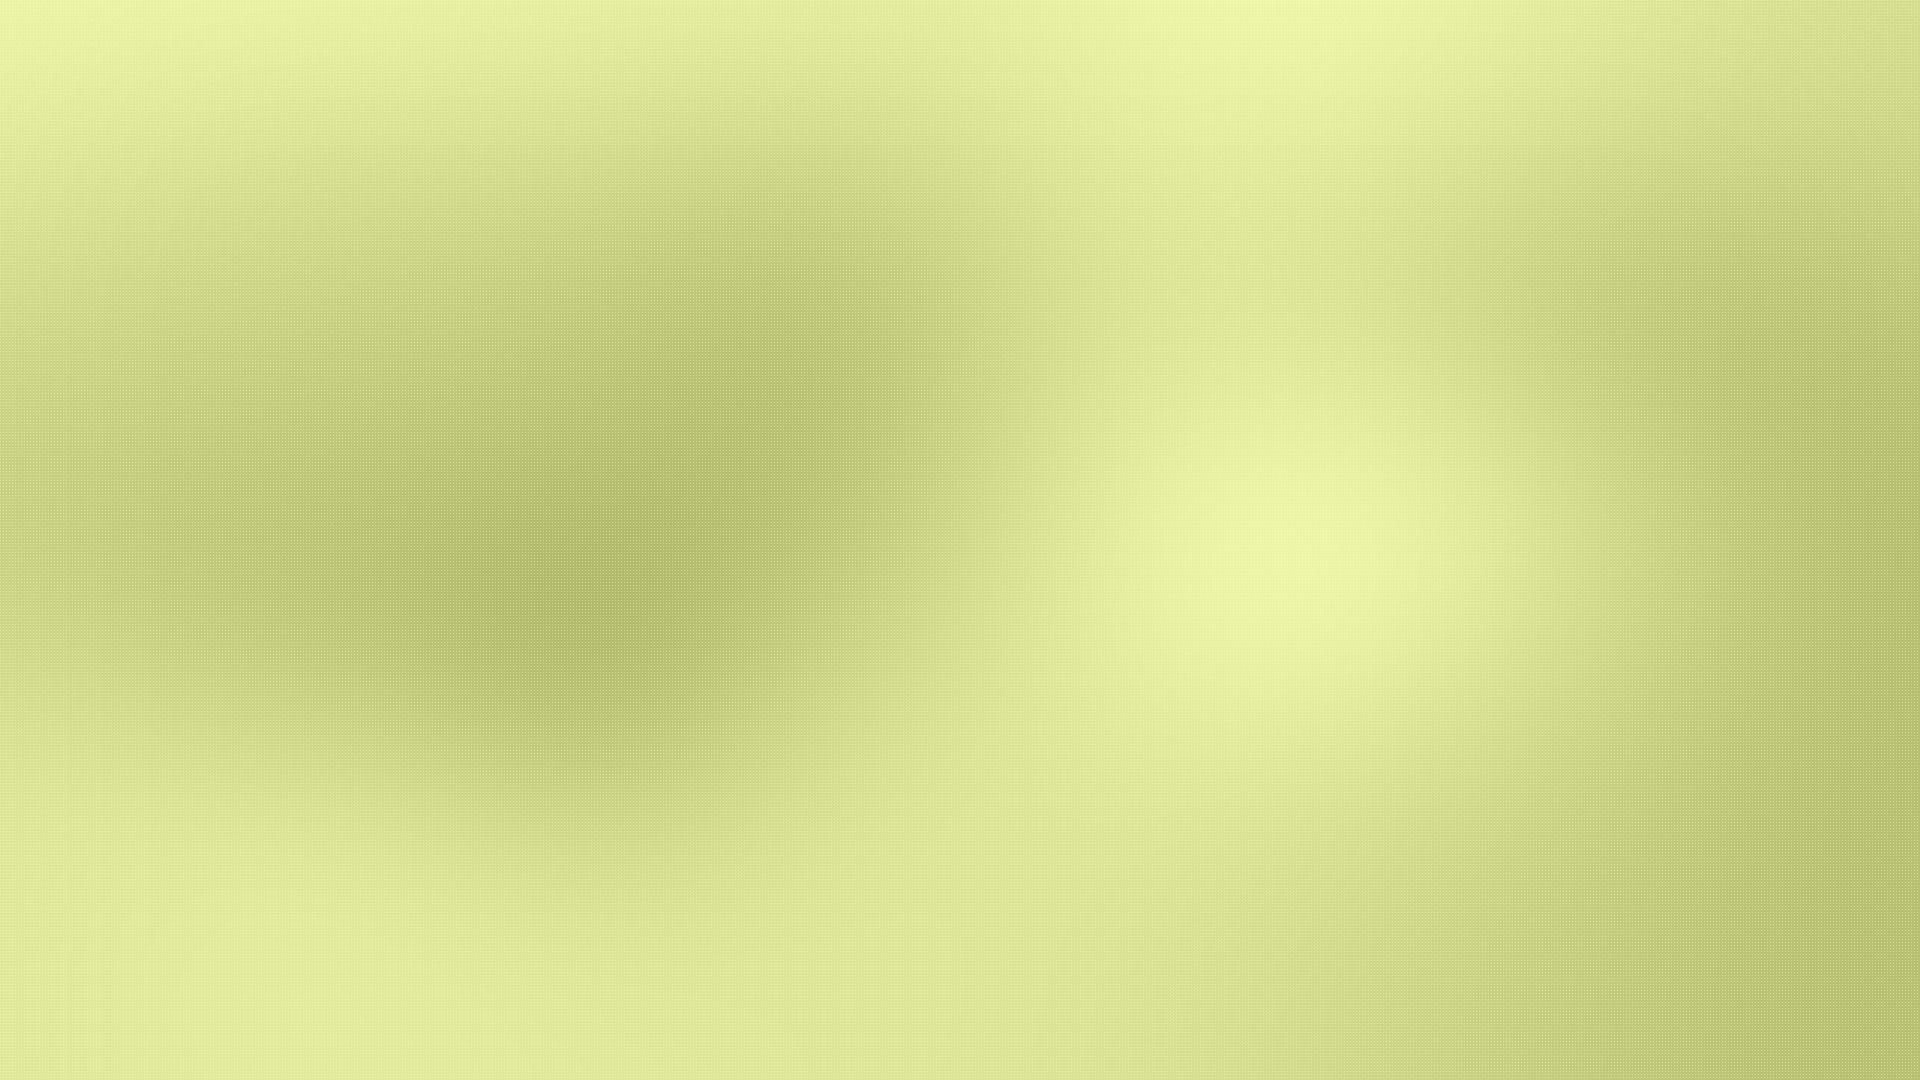 Elegant_Background-mio